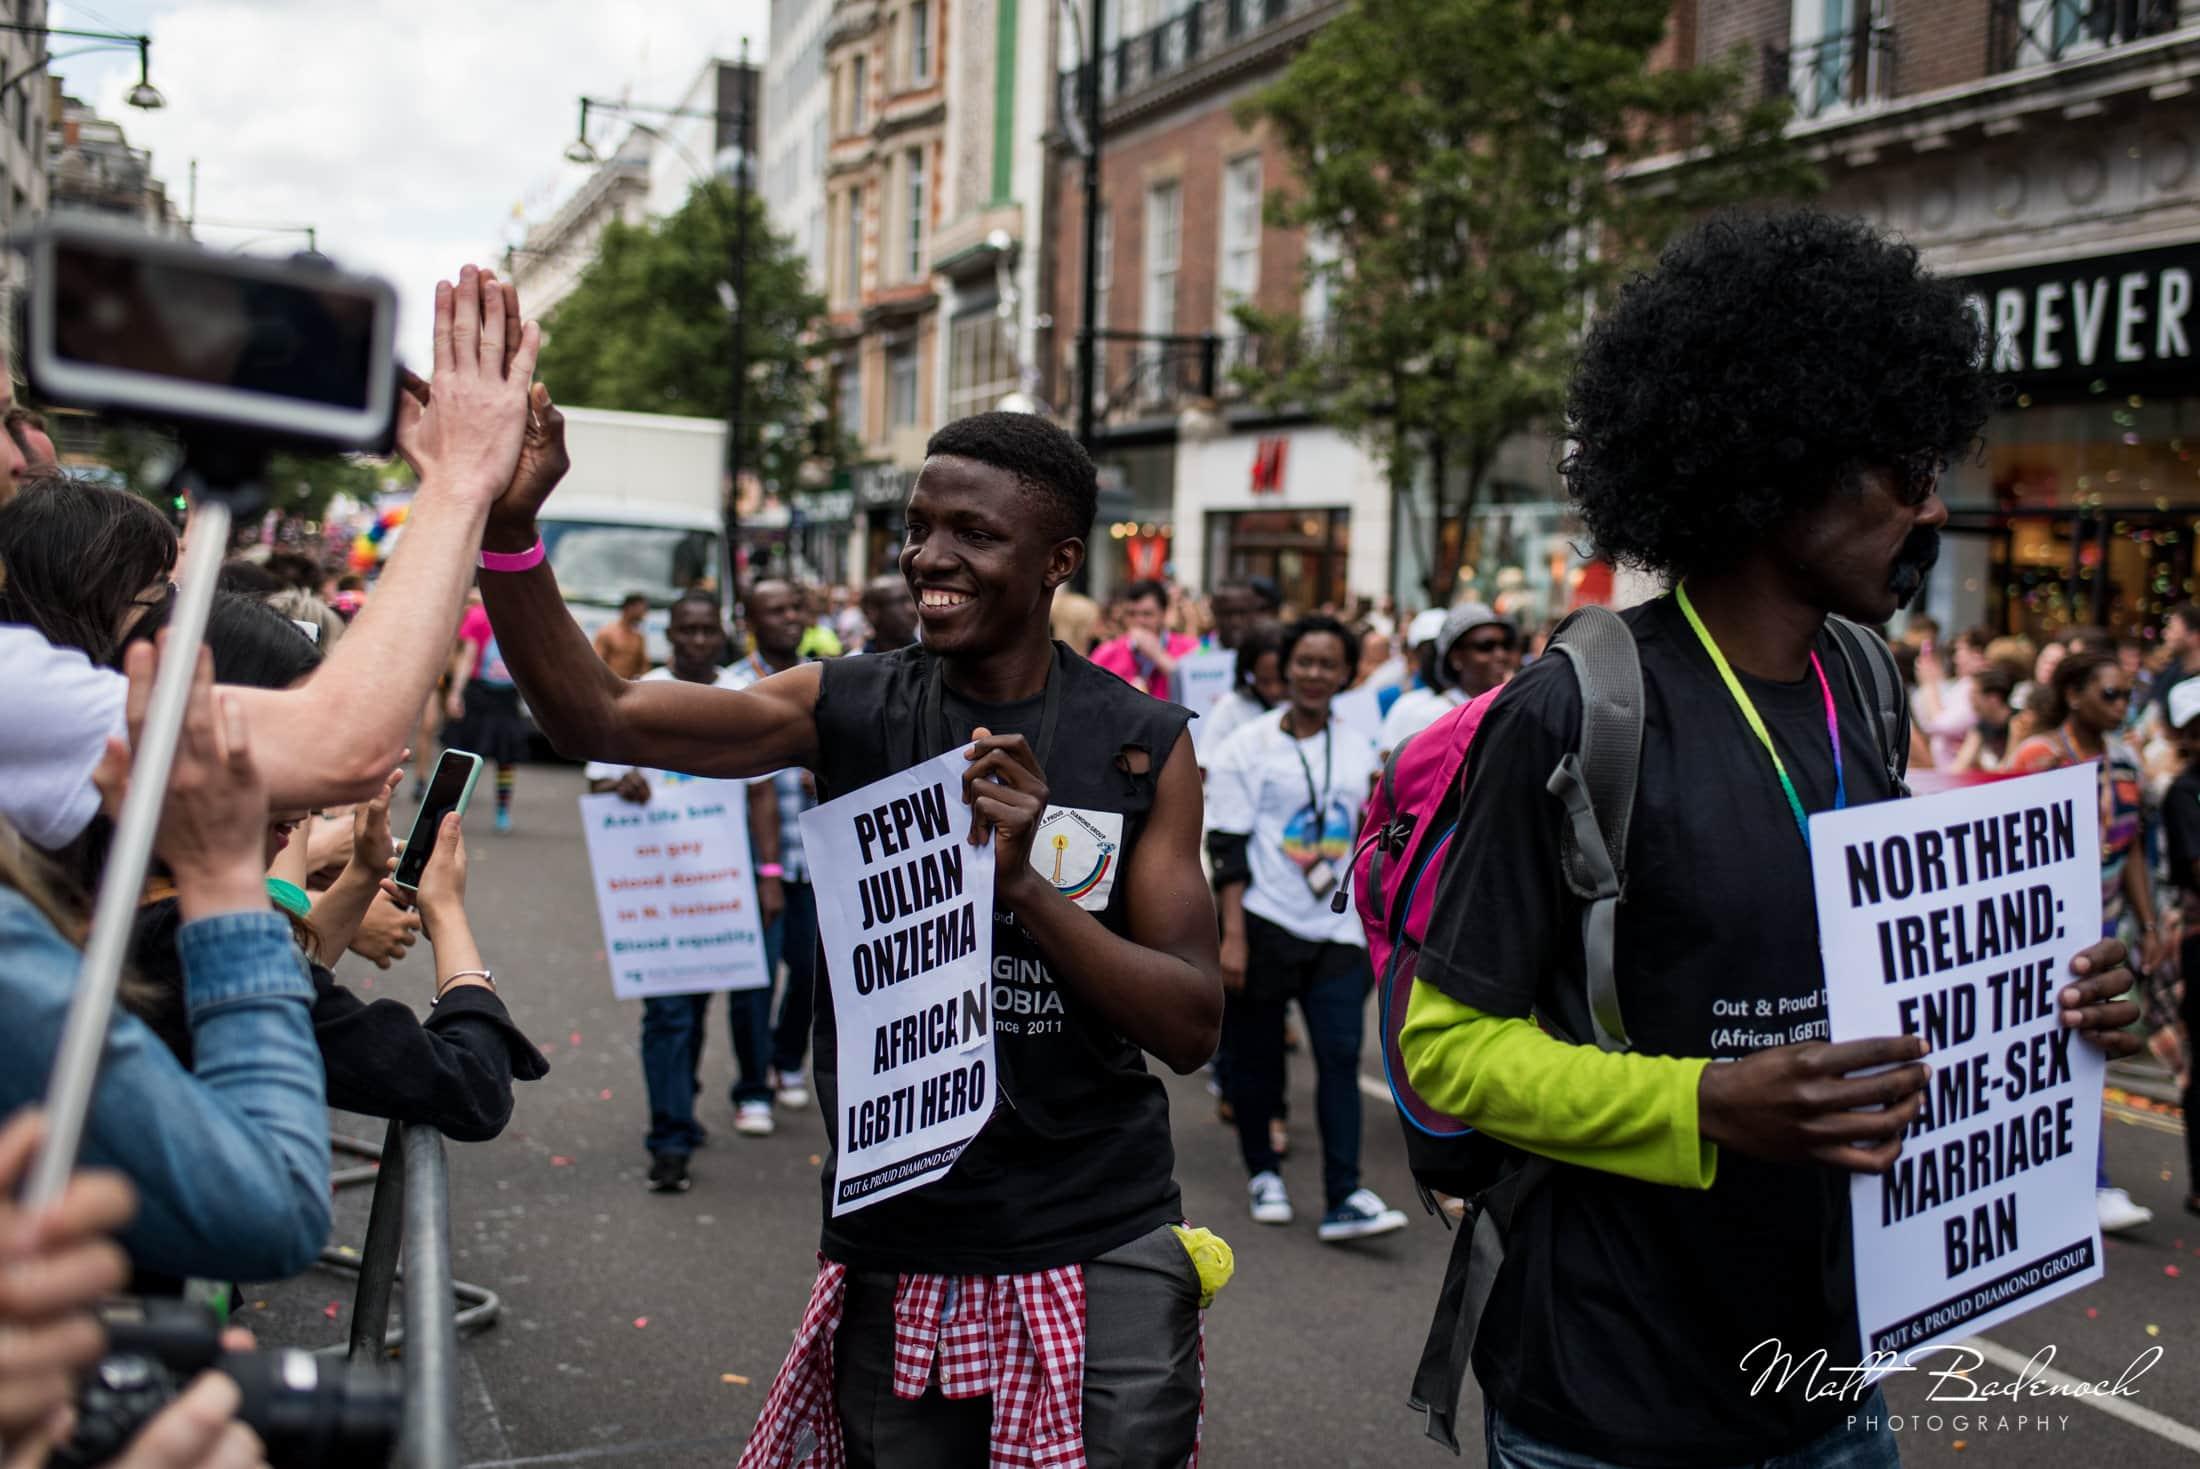 London Pride Parade 2015 Photos